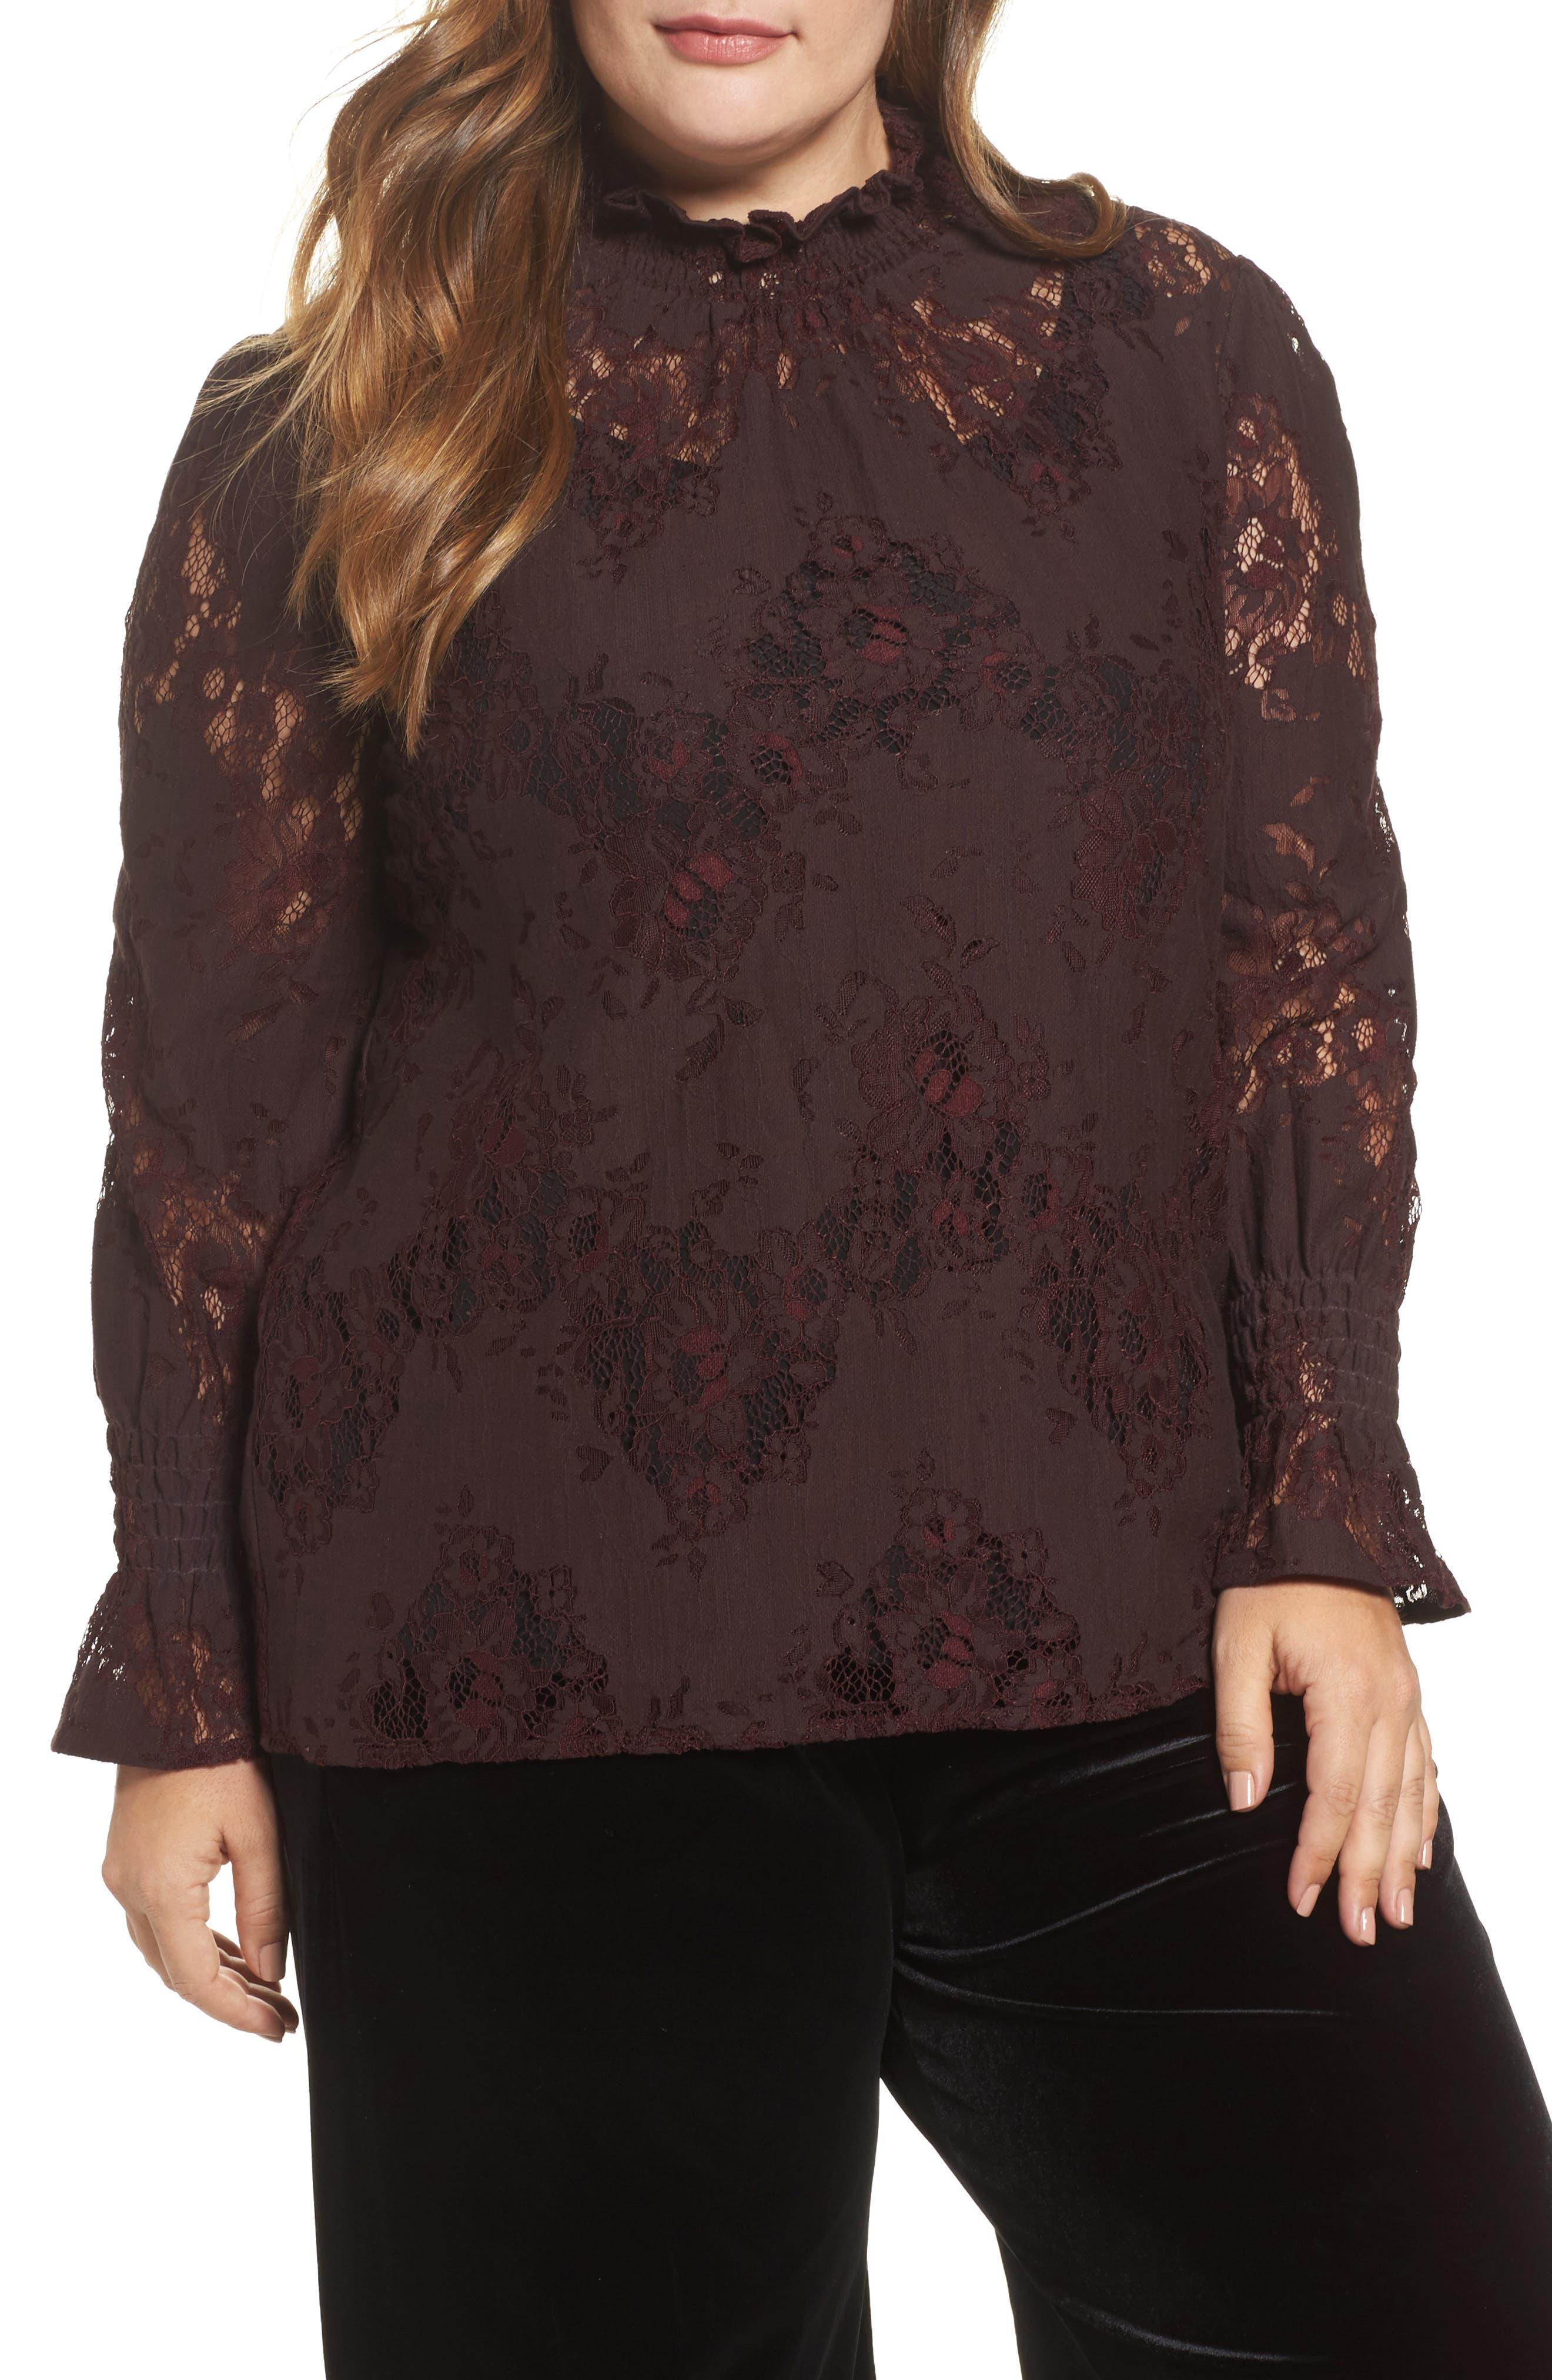 Main Image - ELVI High Neck Ruffle & Lace Blouse (Plus Size)